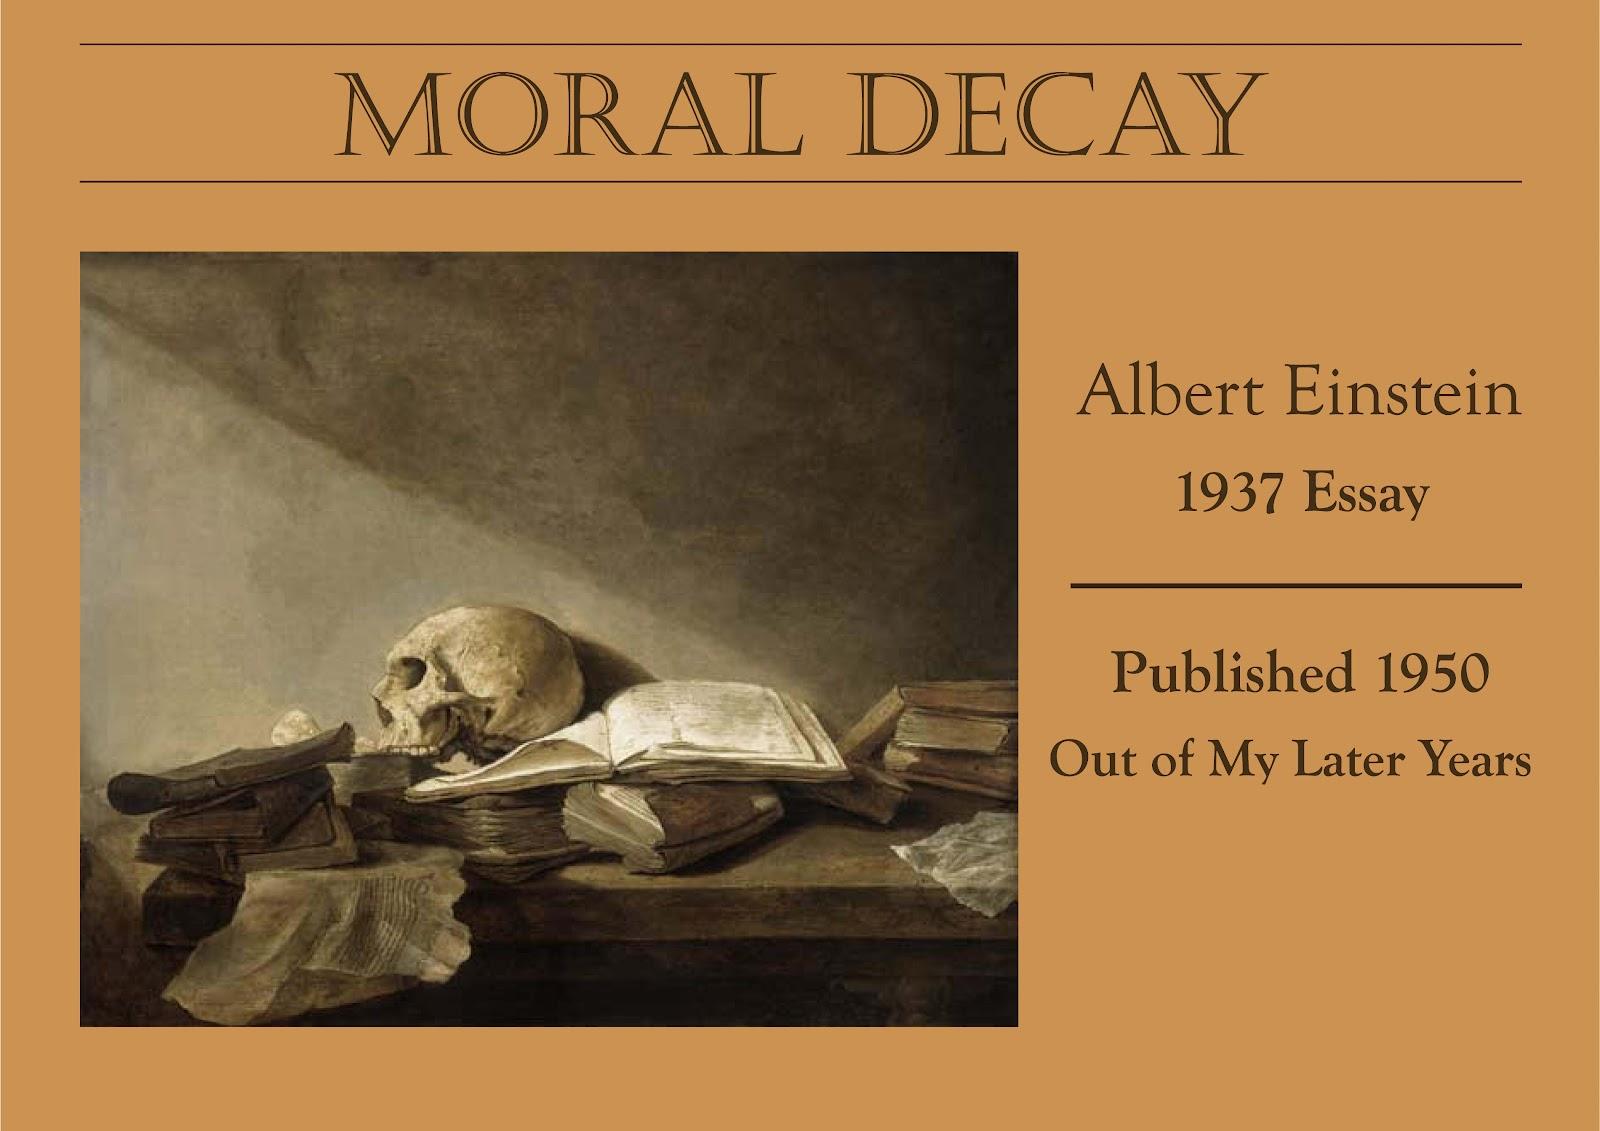 essay about einstein com einstein s german world fritz stern  my science heroes einstein moral decay this particular essay seems timely for all of us it